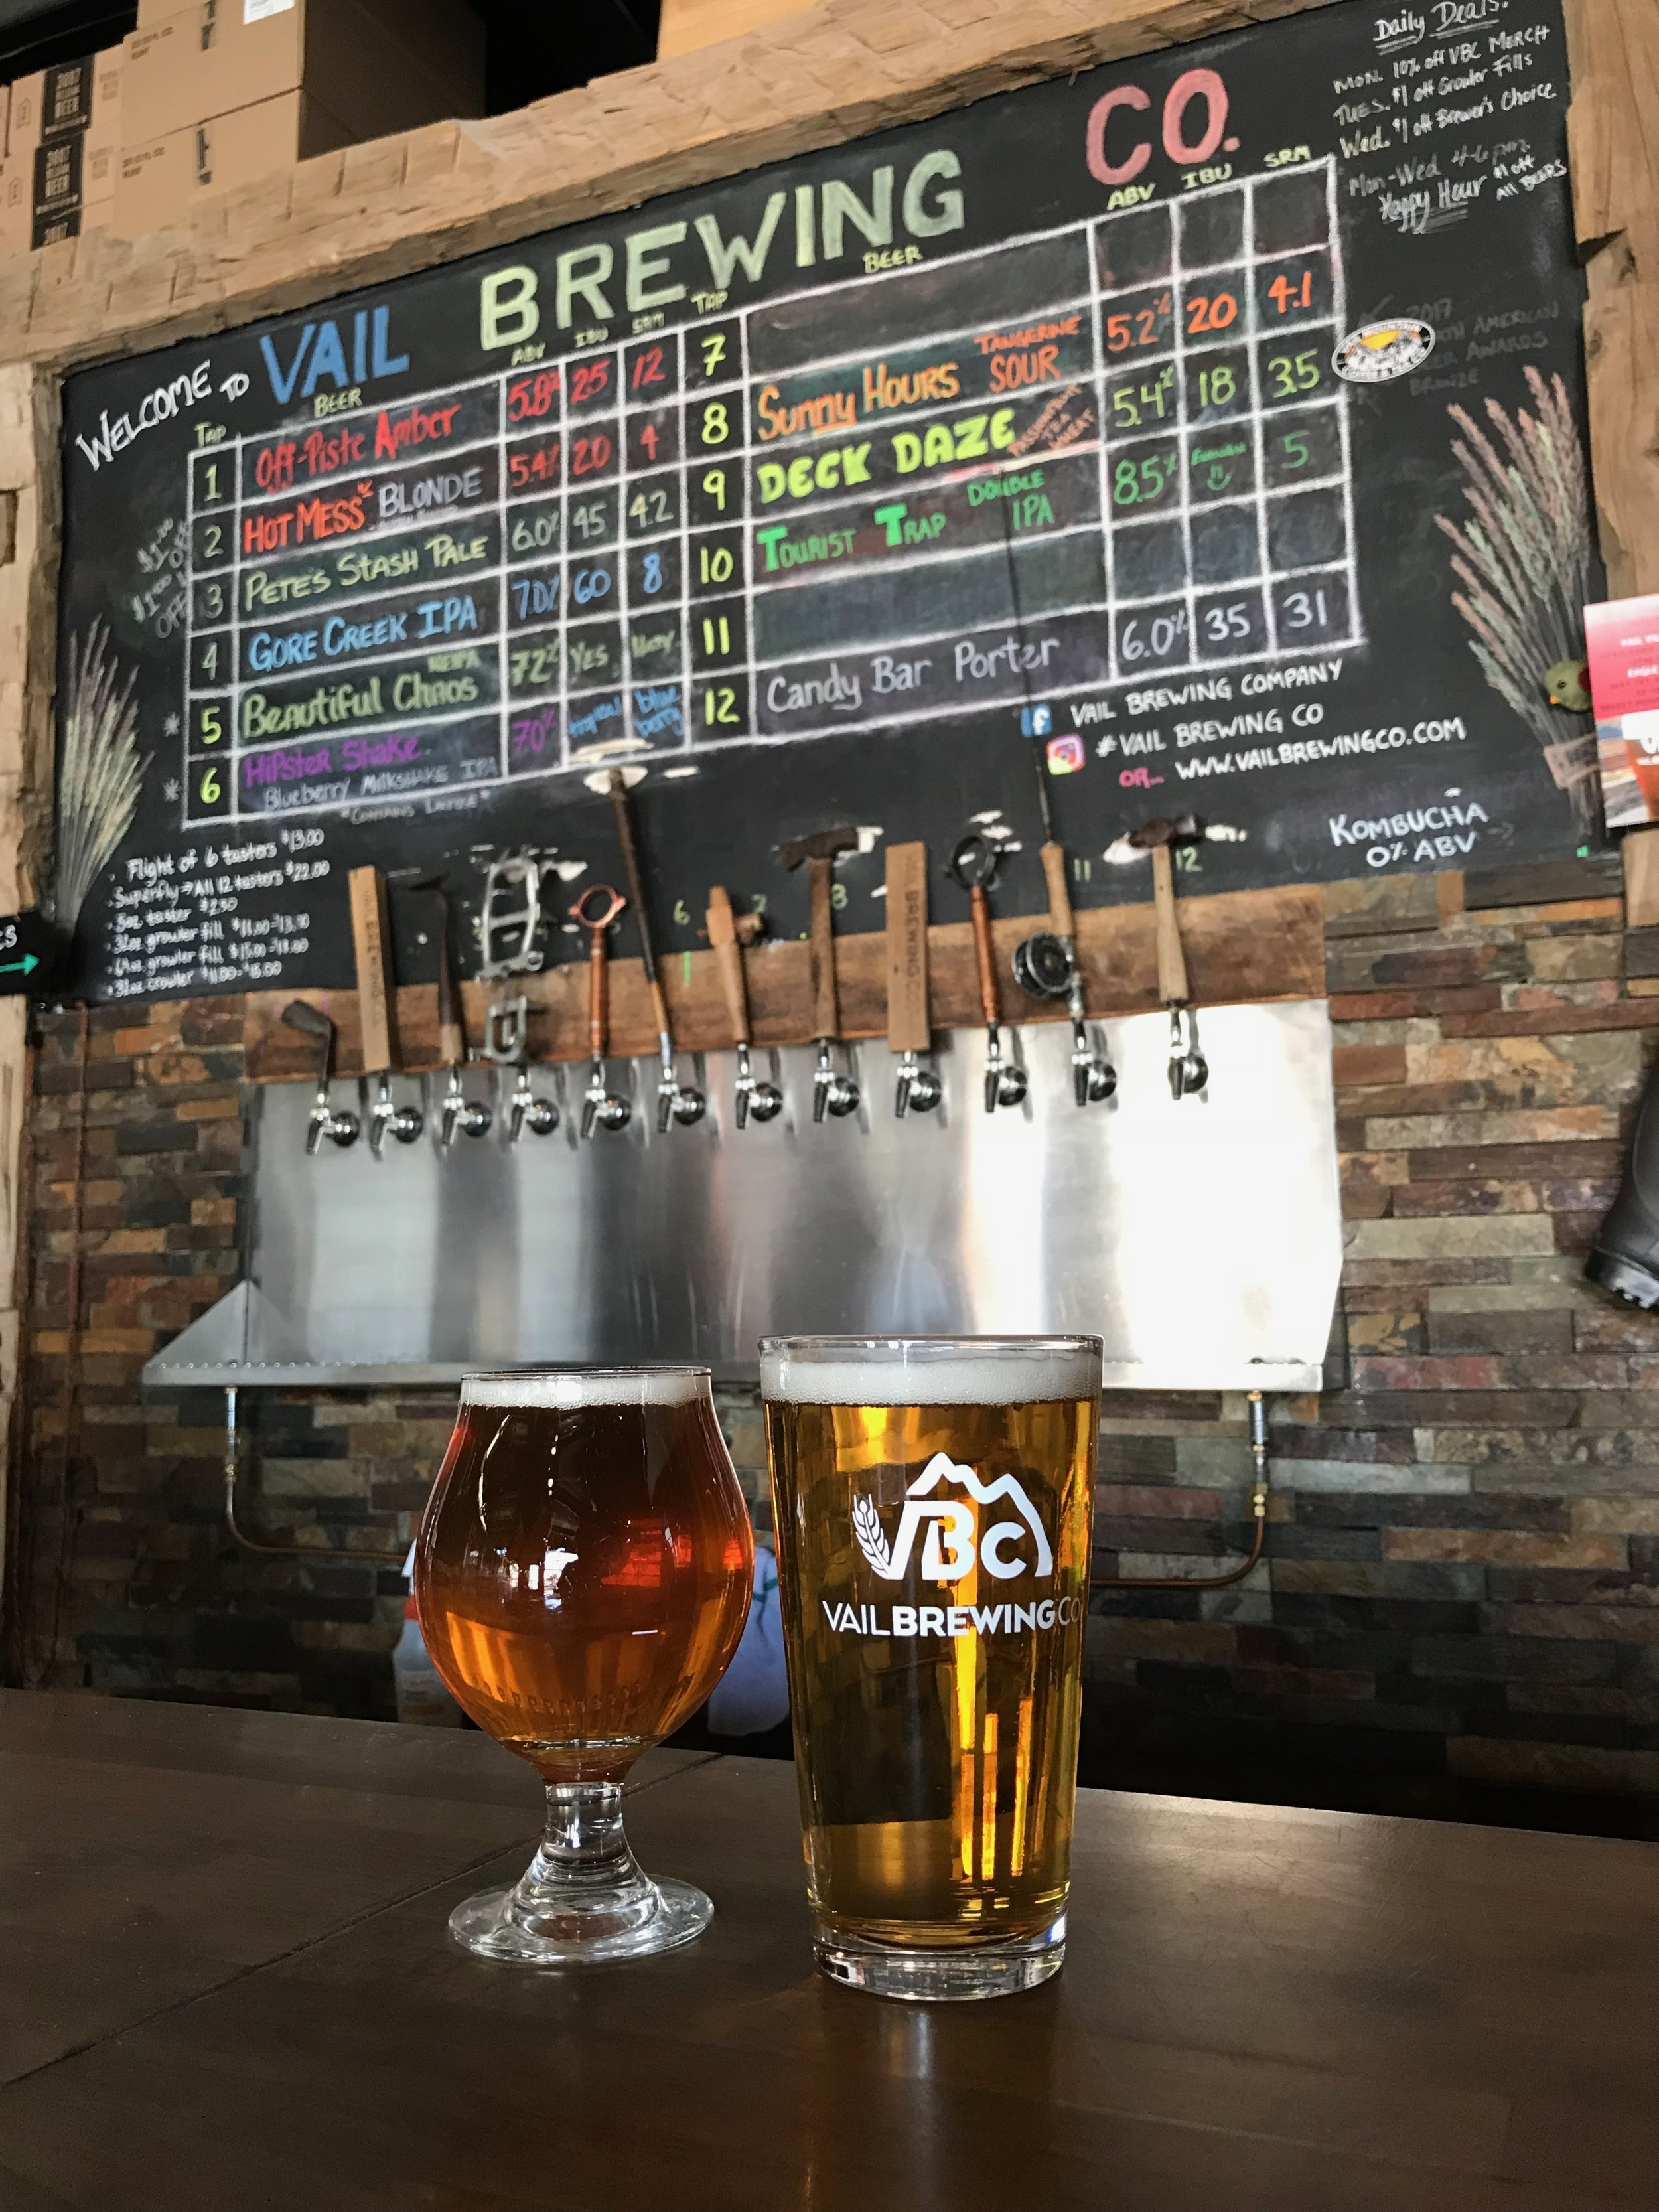 Pit stop at Vail Brewing Company!